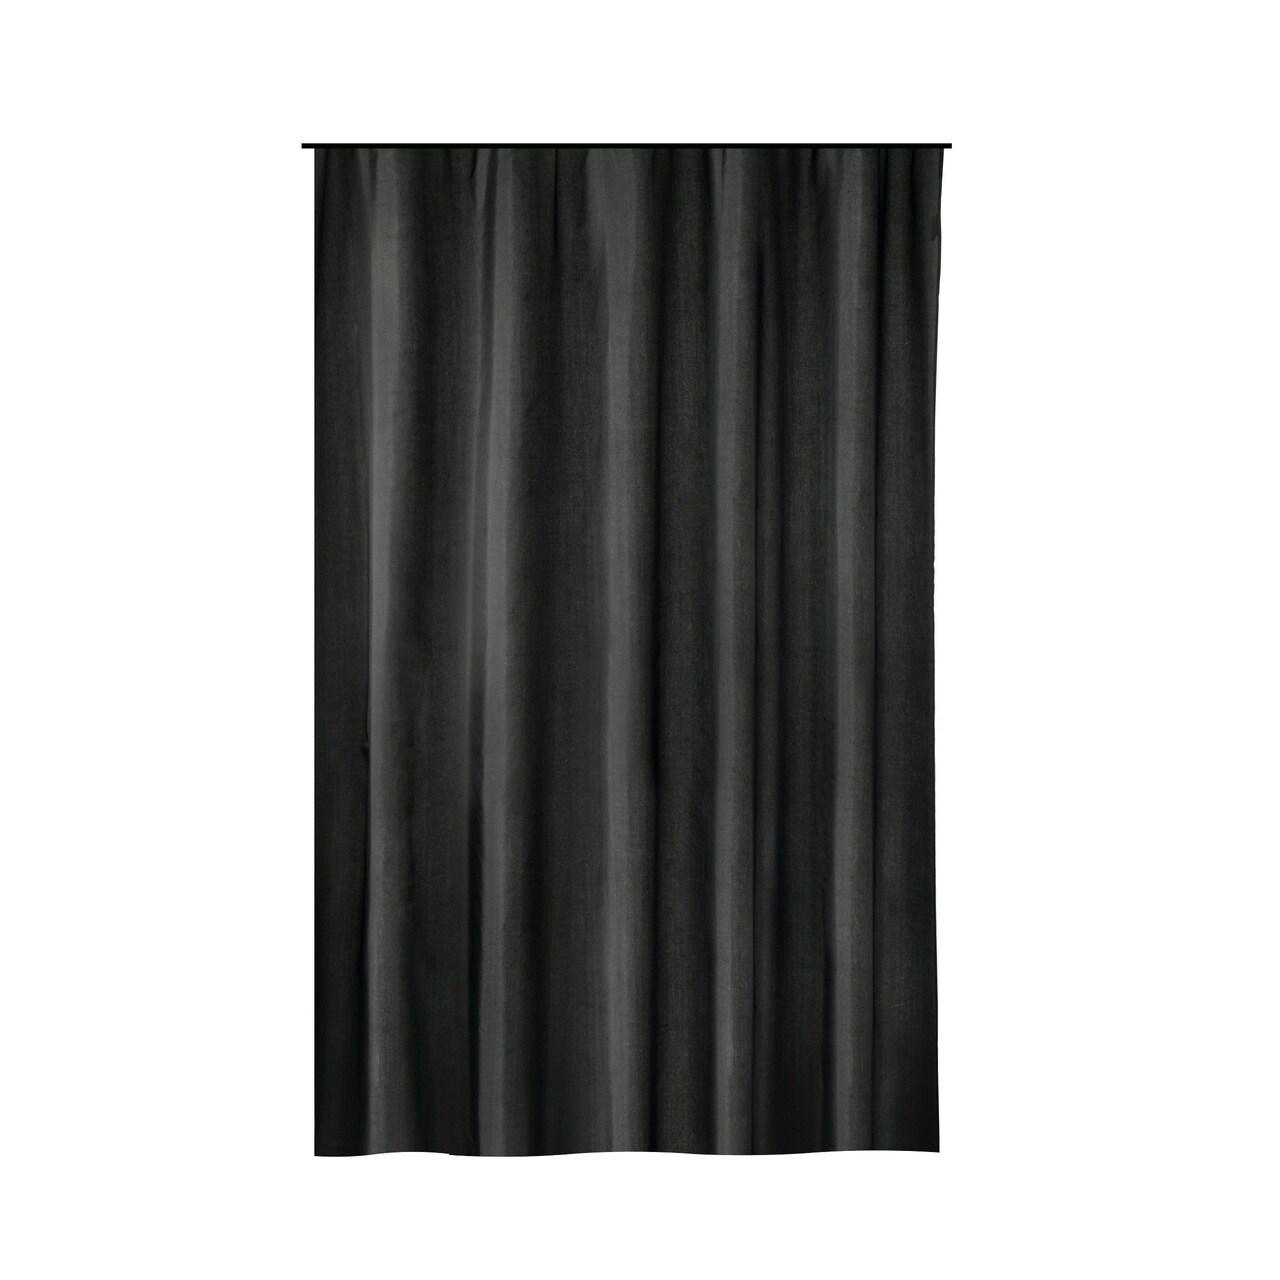 Gamma Extra Long Shower Curtain 78 X 72 Inch Black Fabric